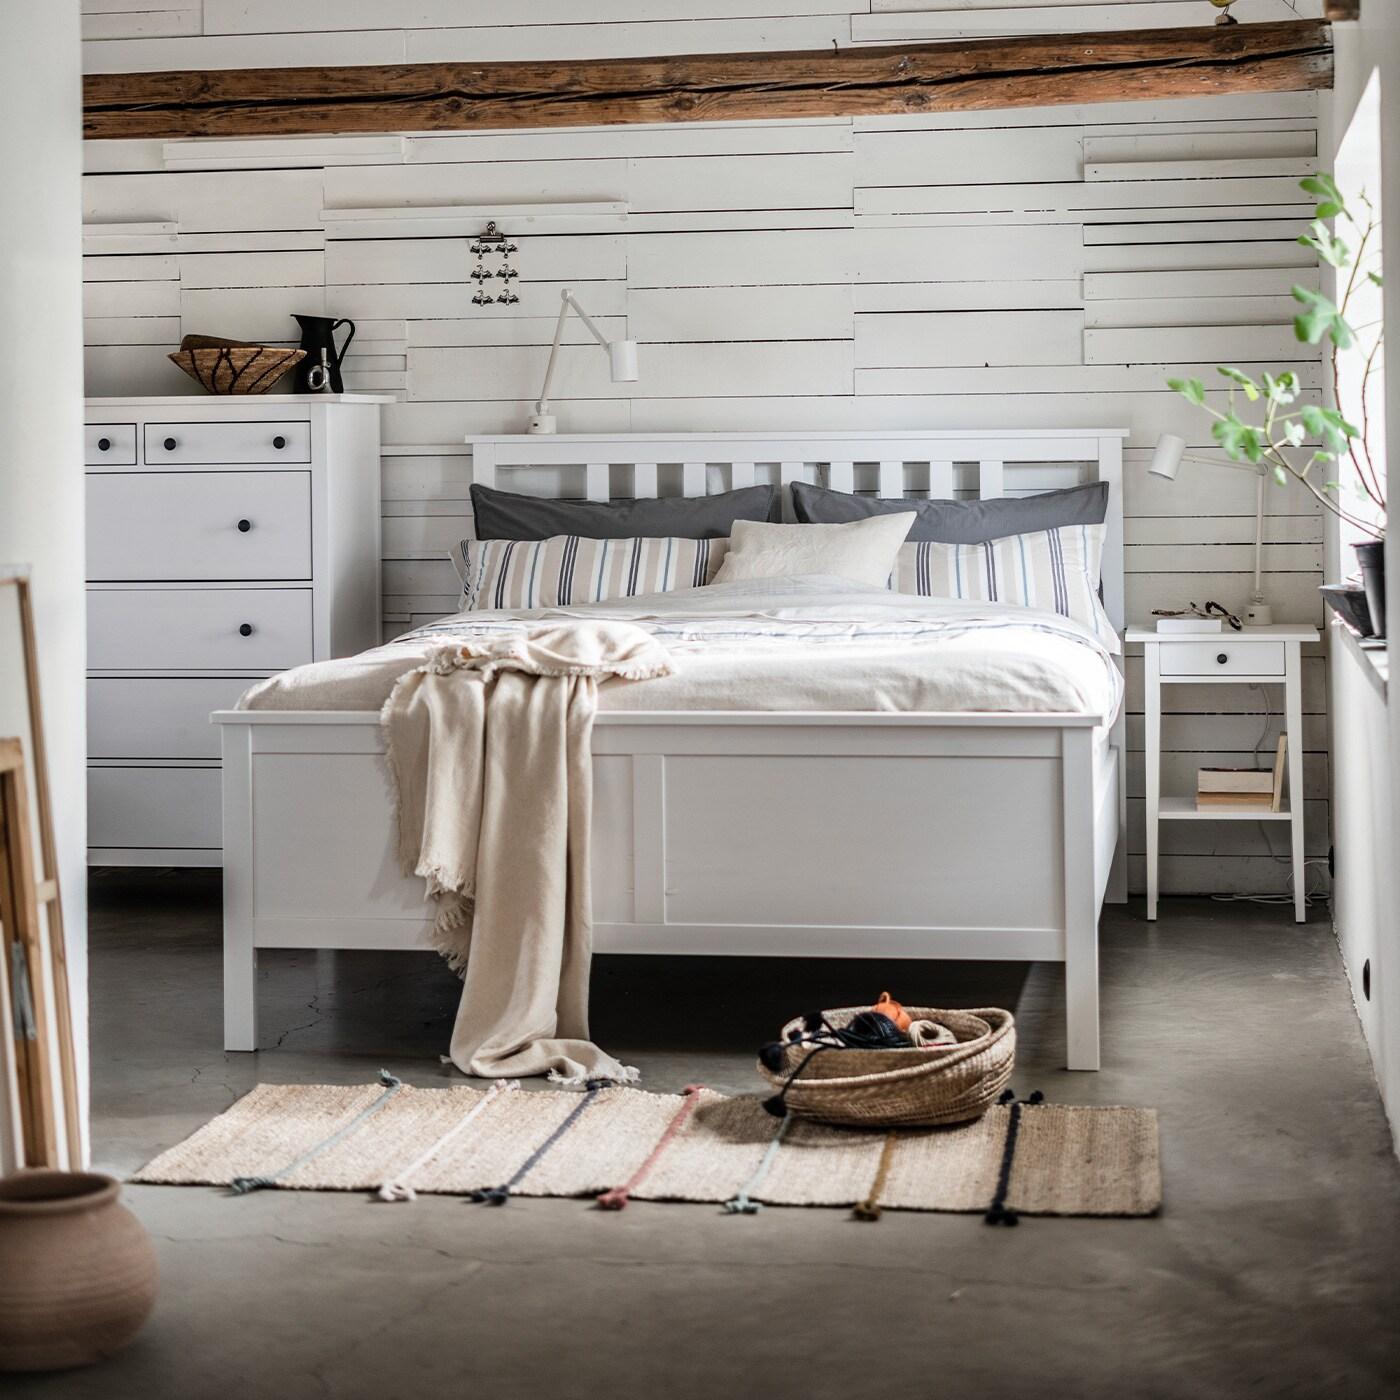 Bedroom - IKEA Mexico